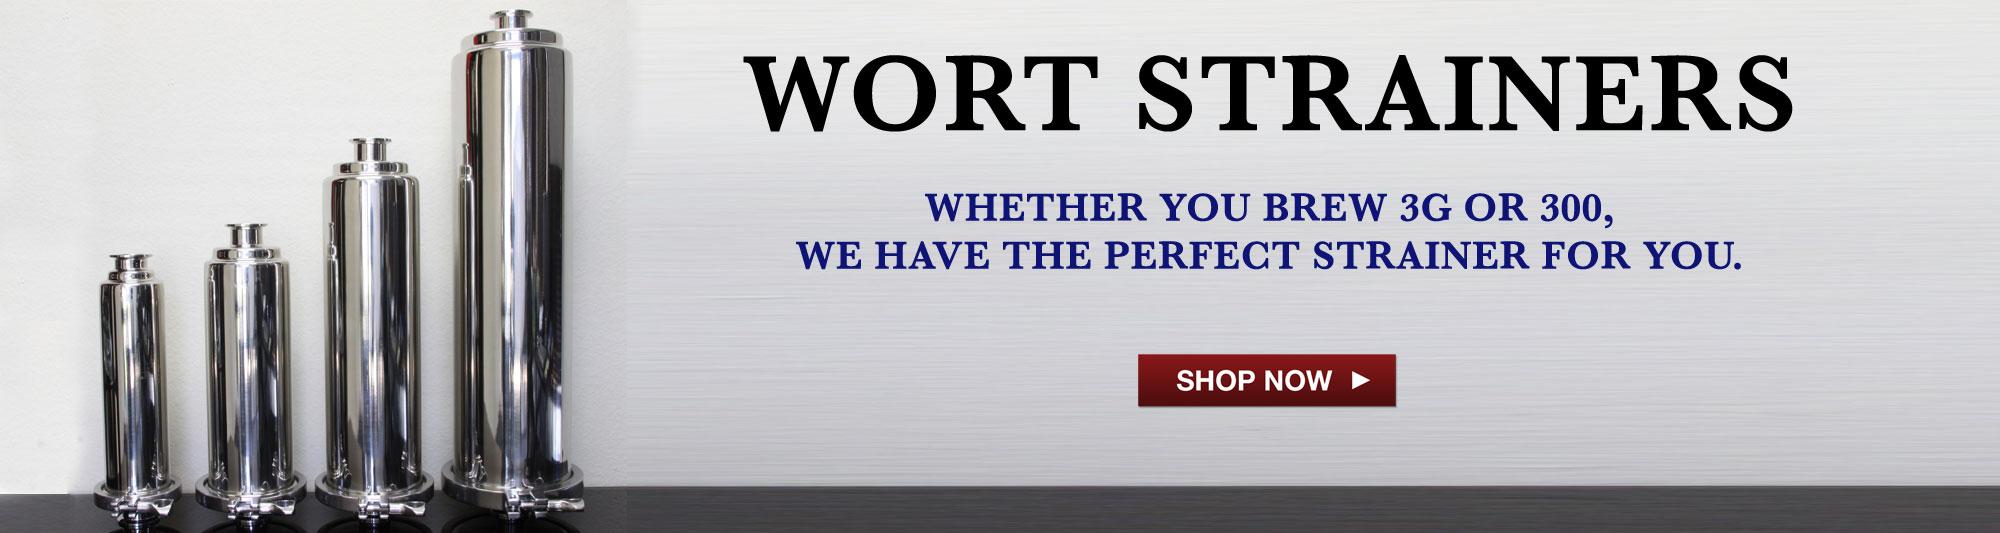 Wort Strainers